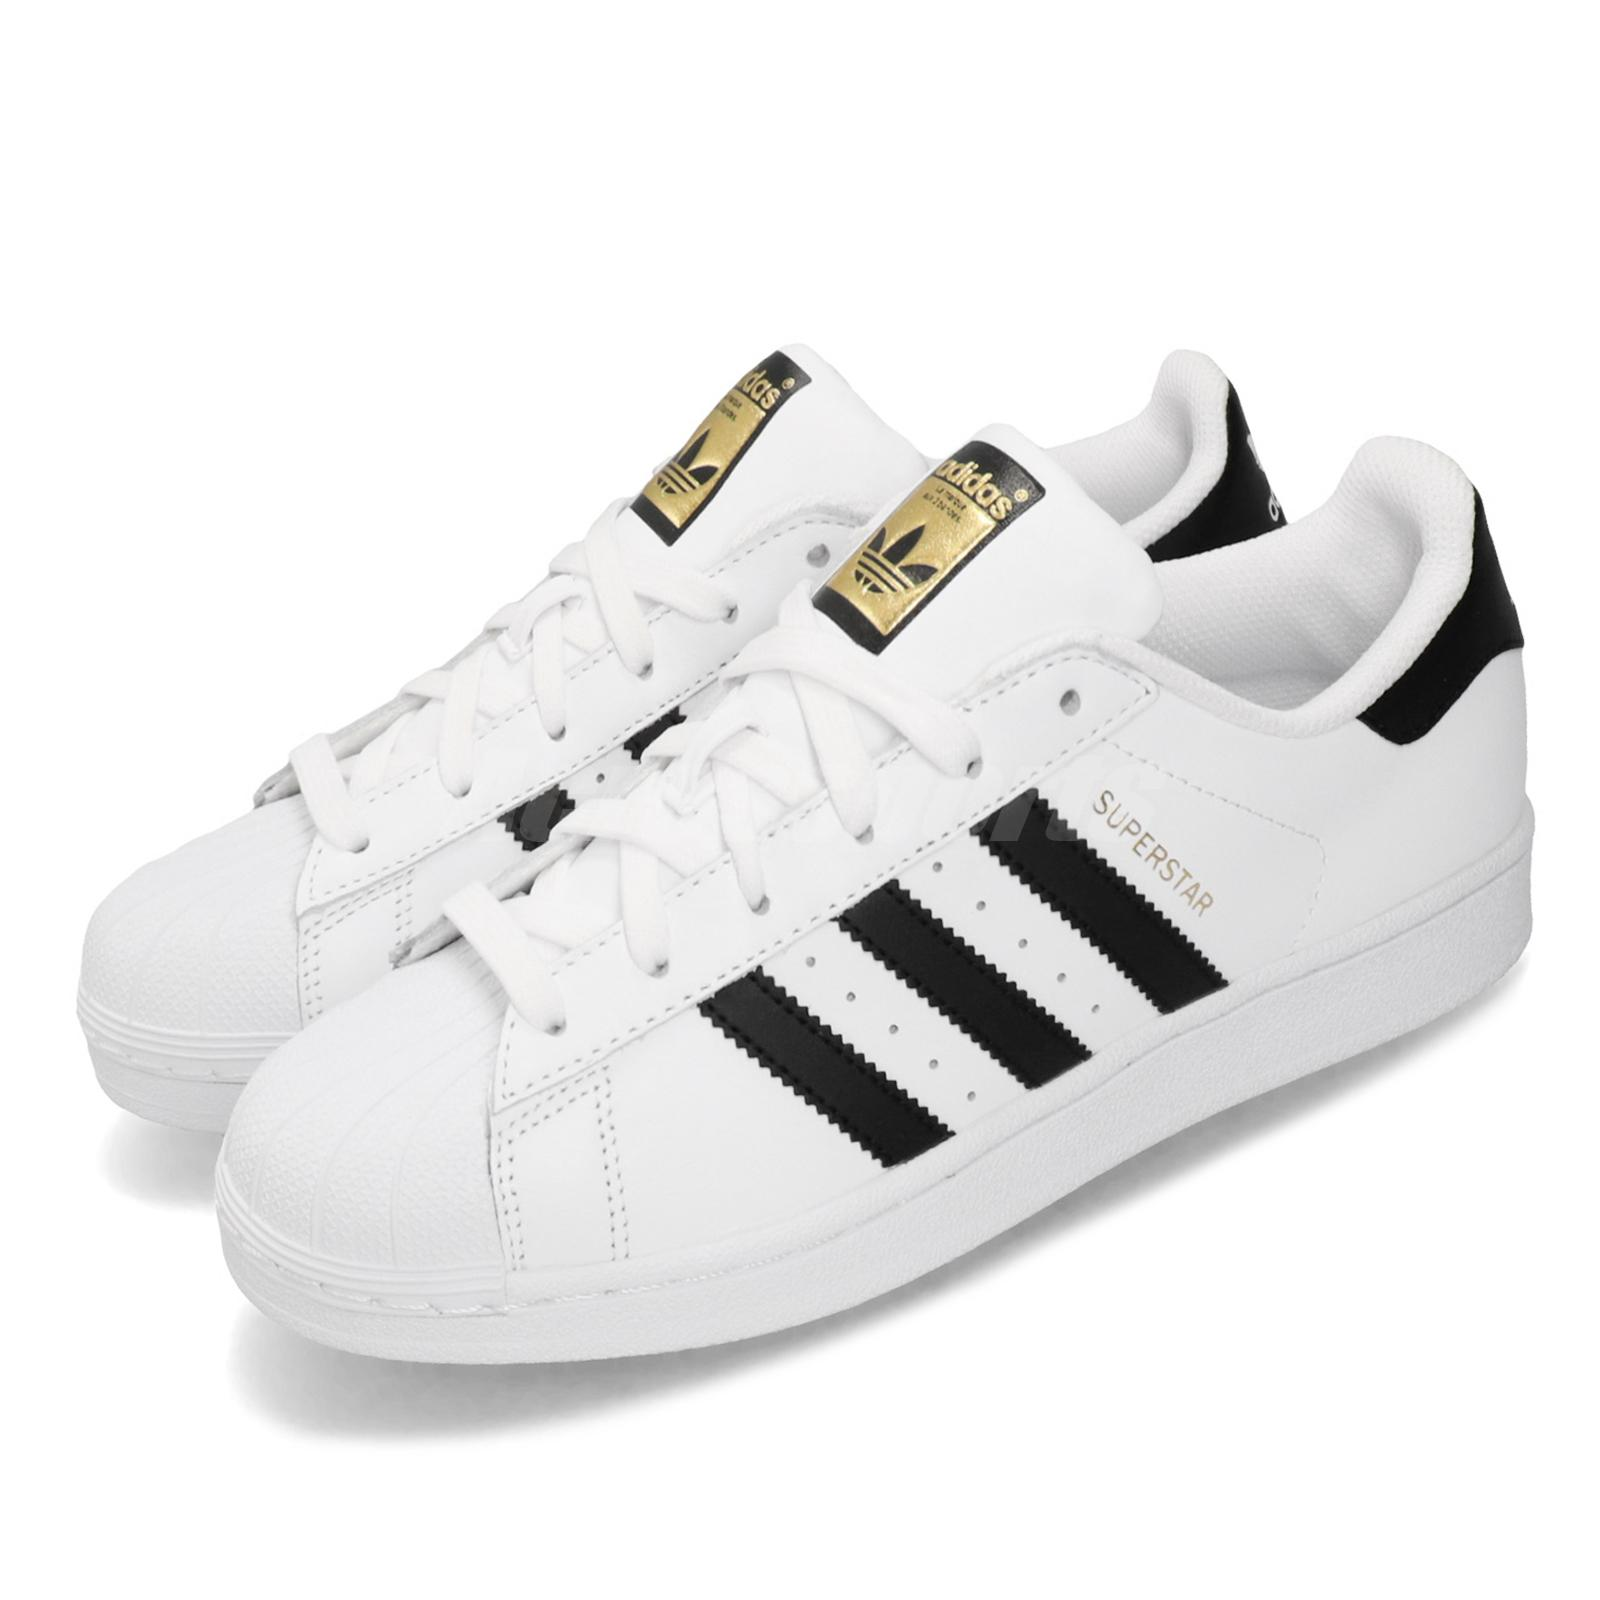 adidas Originals Superstar White Black